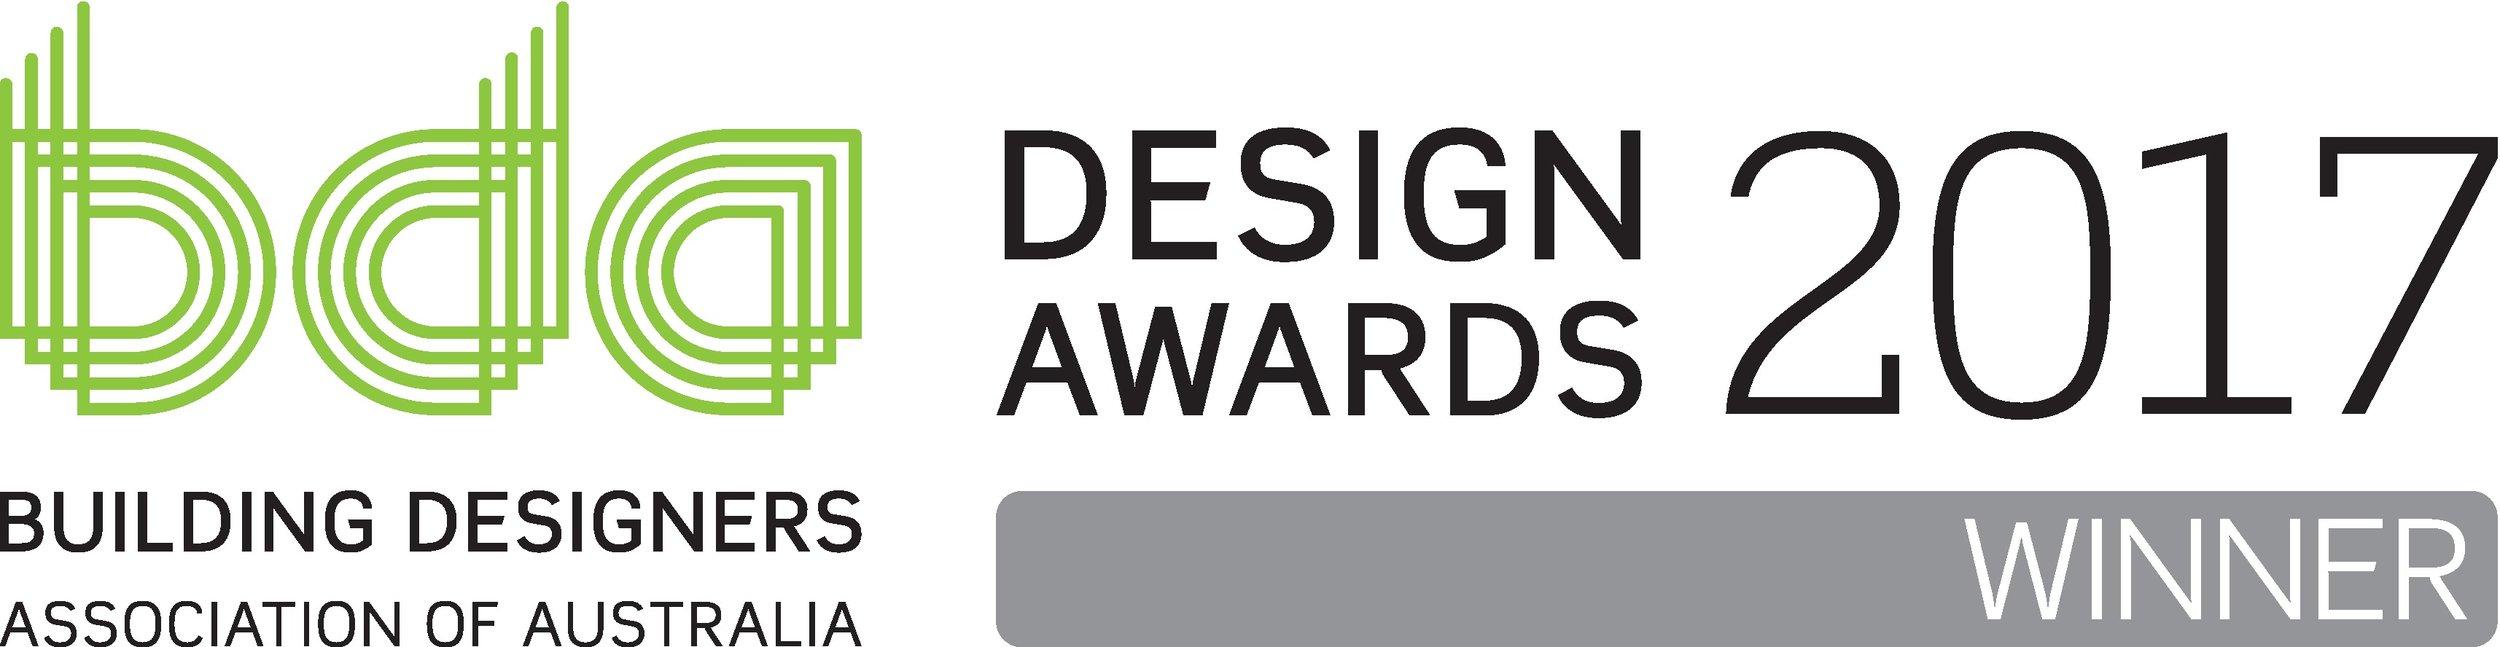 BDA_design_awards_logo_2017_positive_winner_CMYK-page-0.jpg